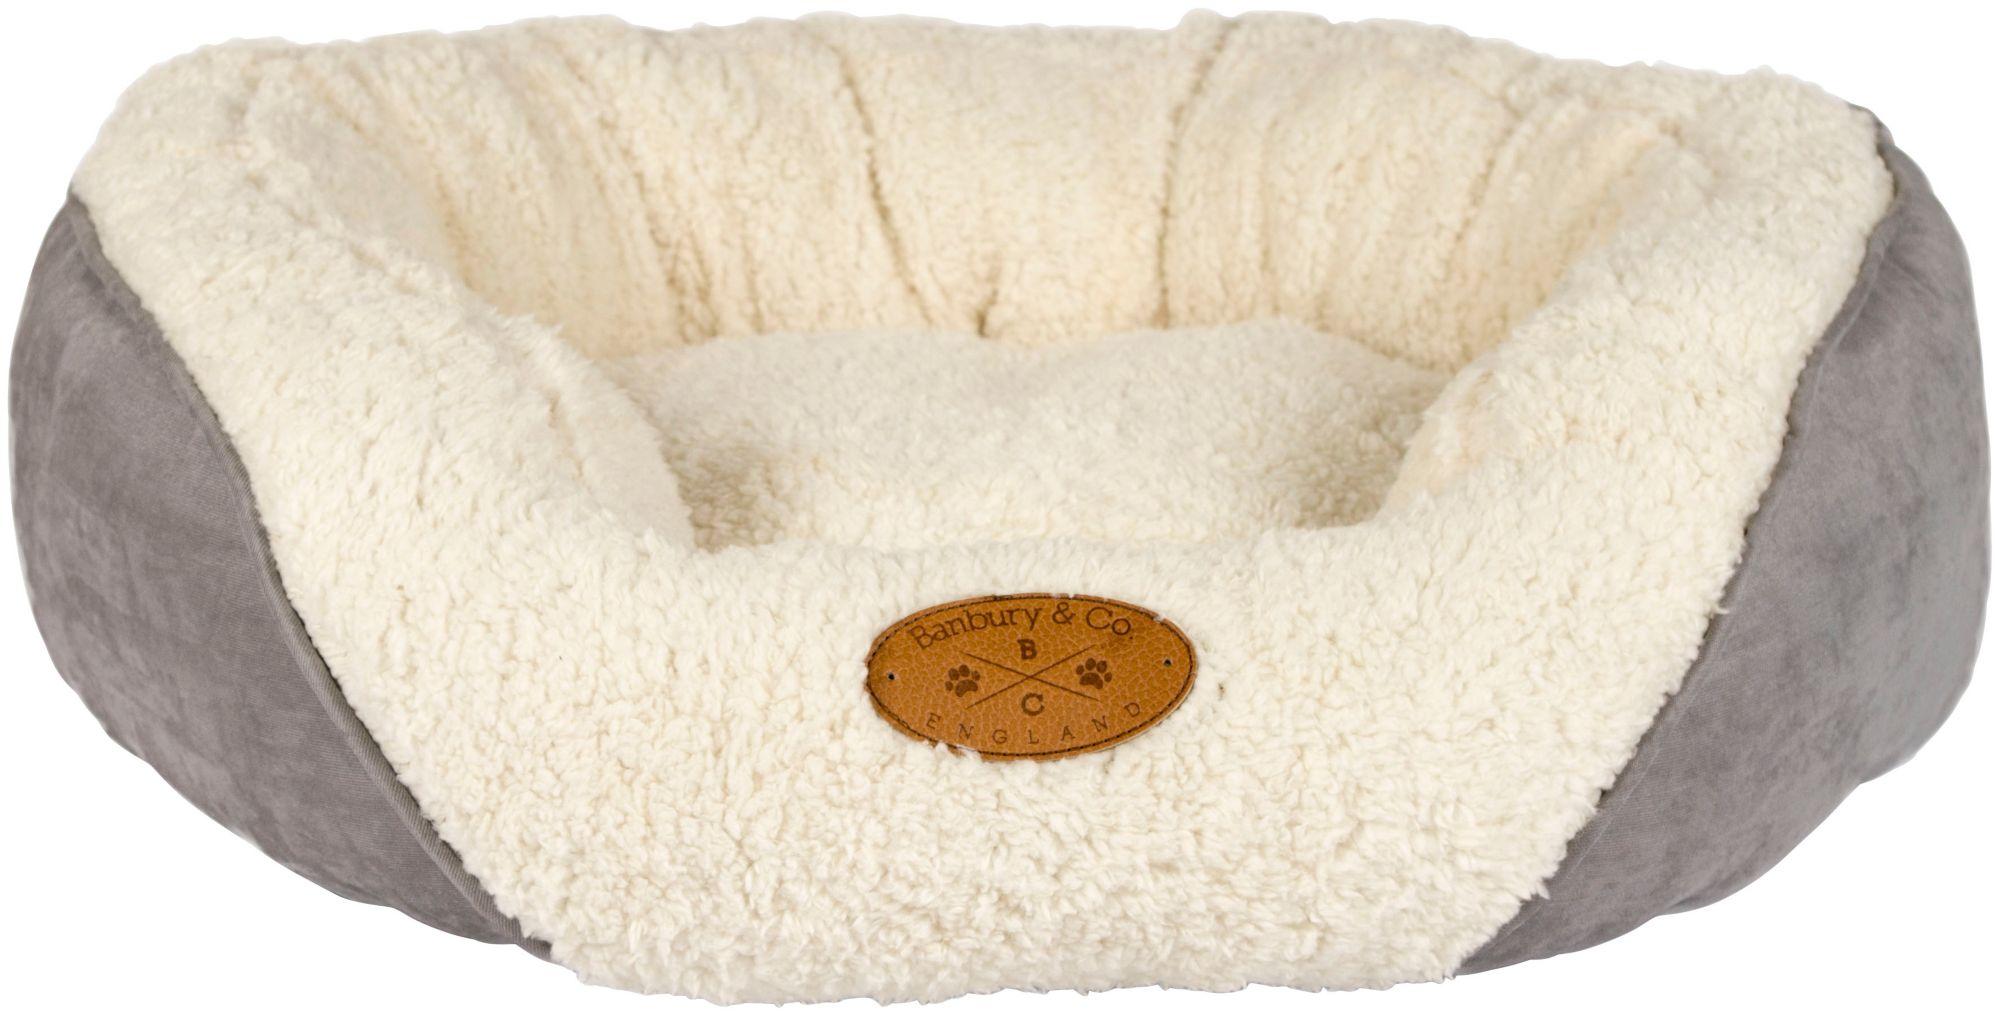 HEIM Hunde-Bett »Banbury Gr. S«